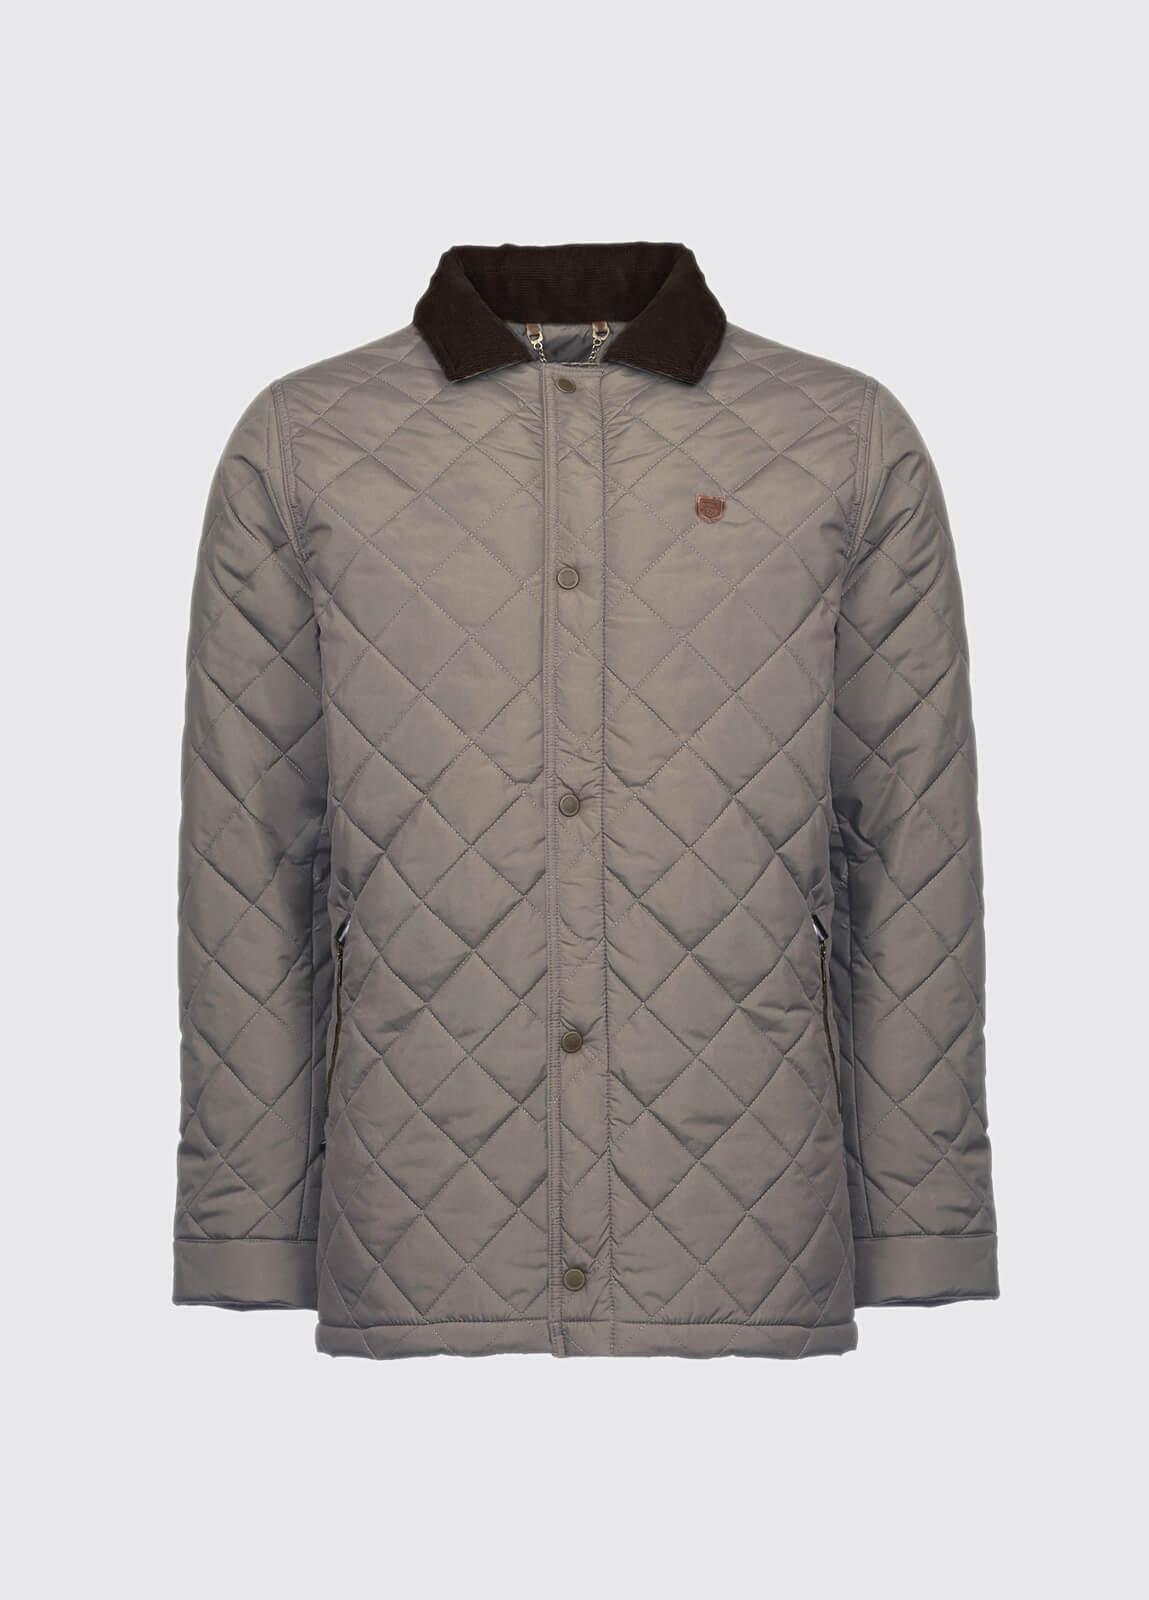 Clonard Men's Jacket - Taupe